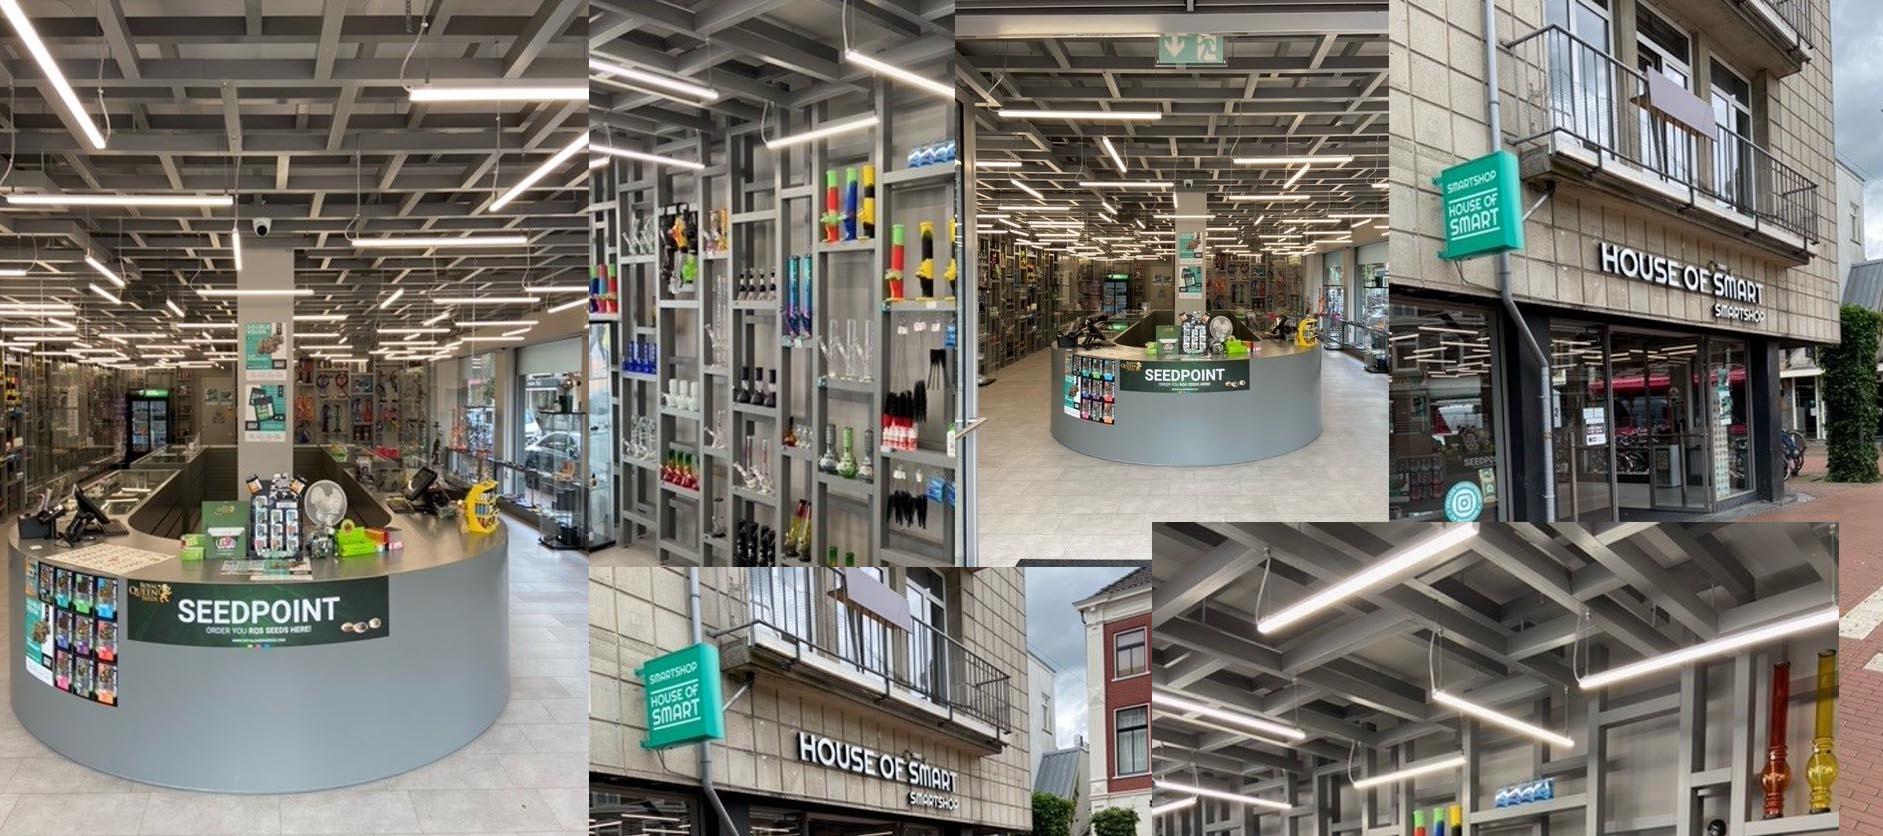 House of smart slider Nijmegen